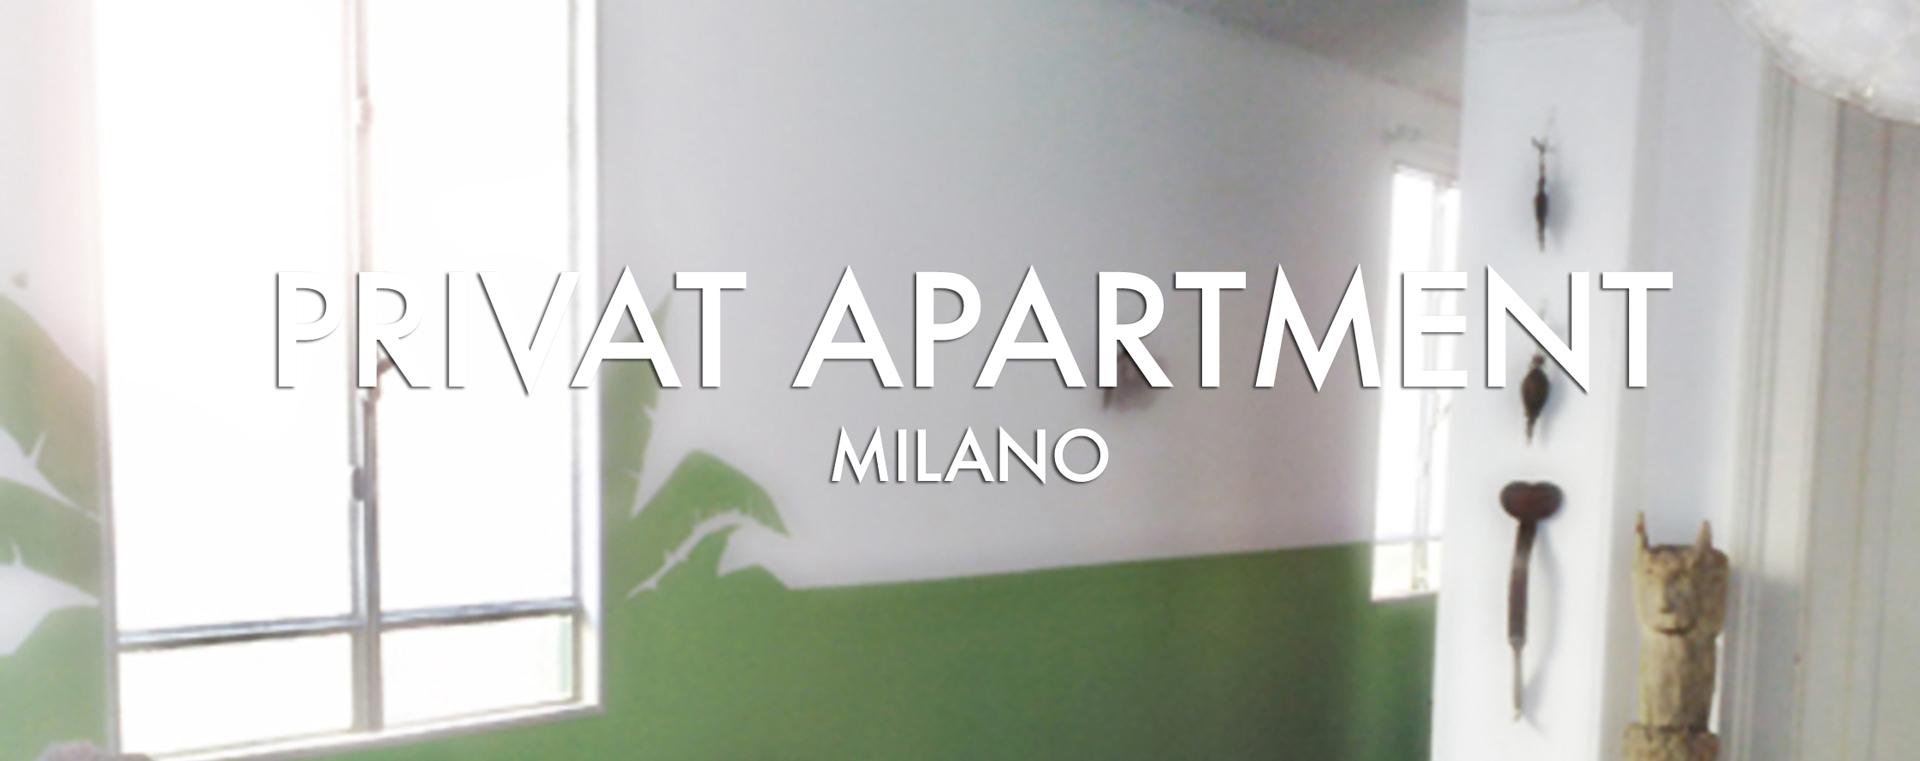 Private apartment Milano